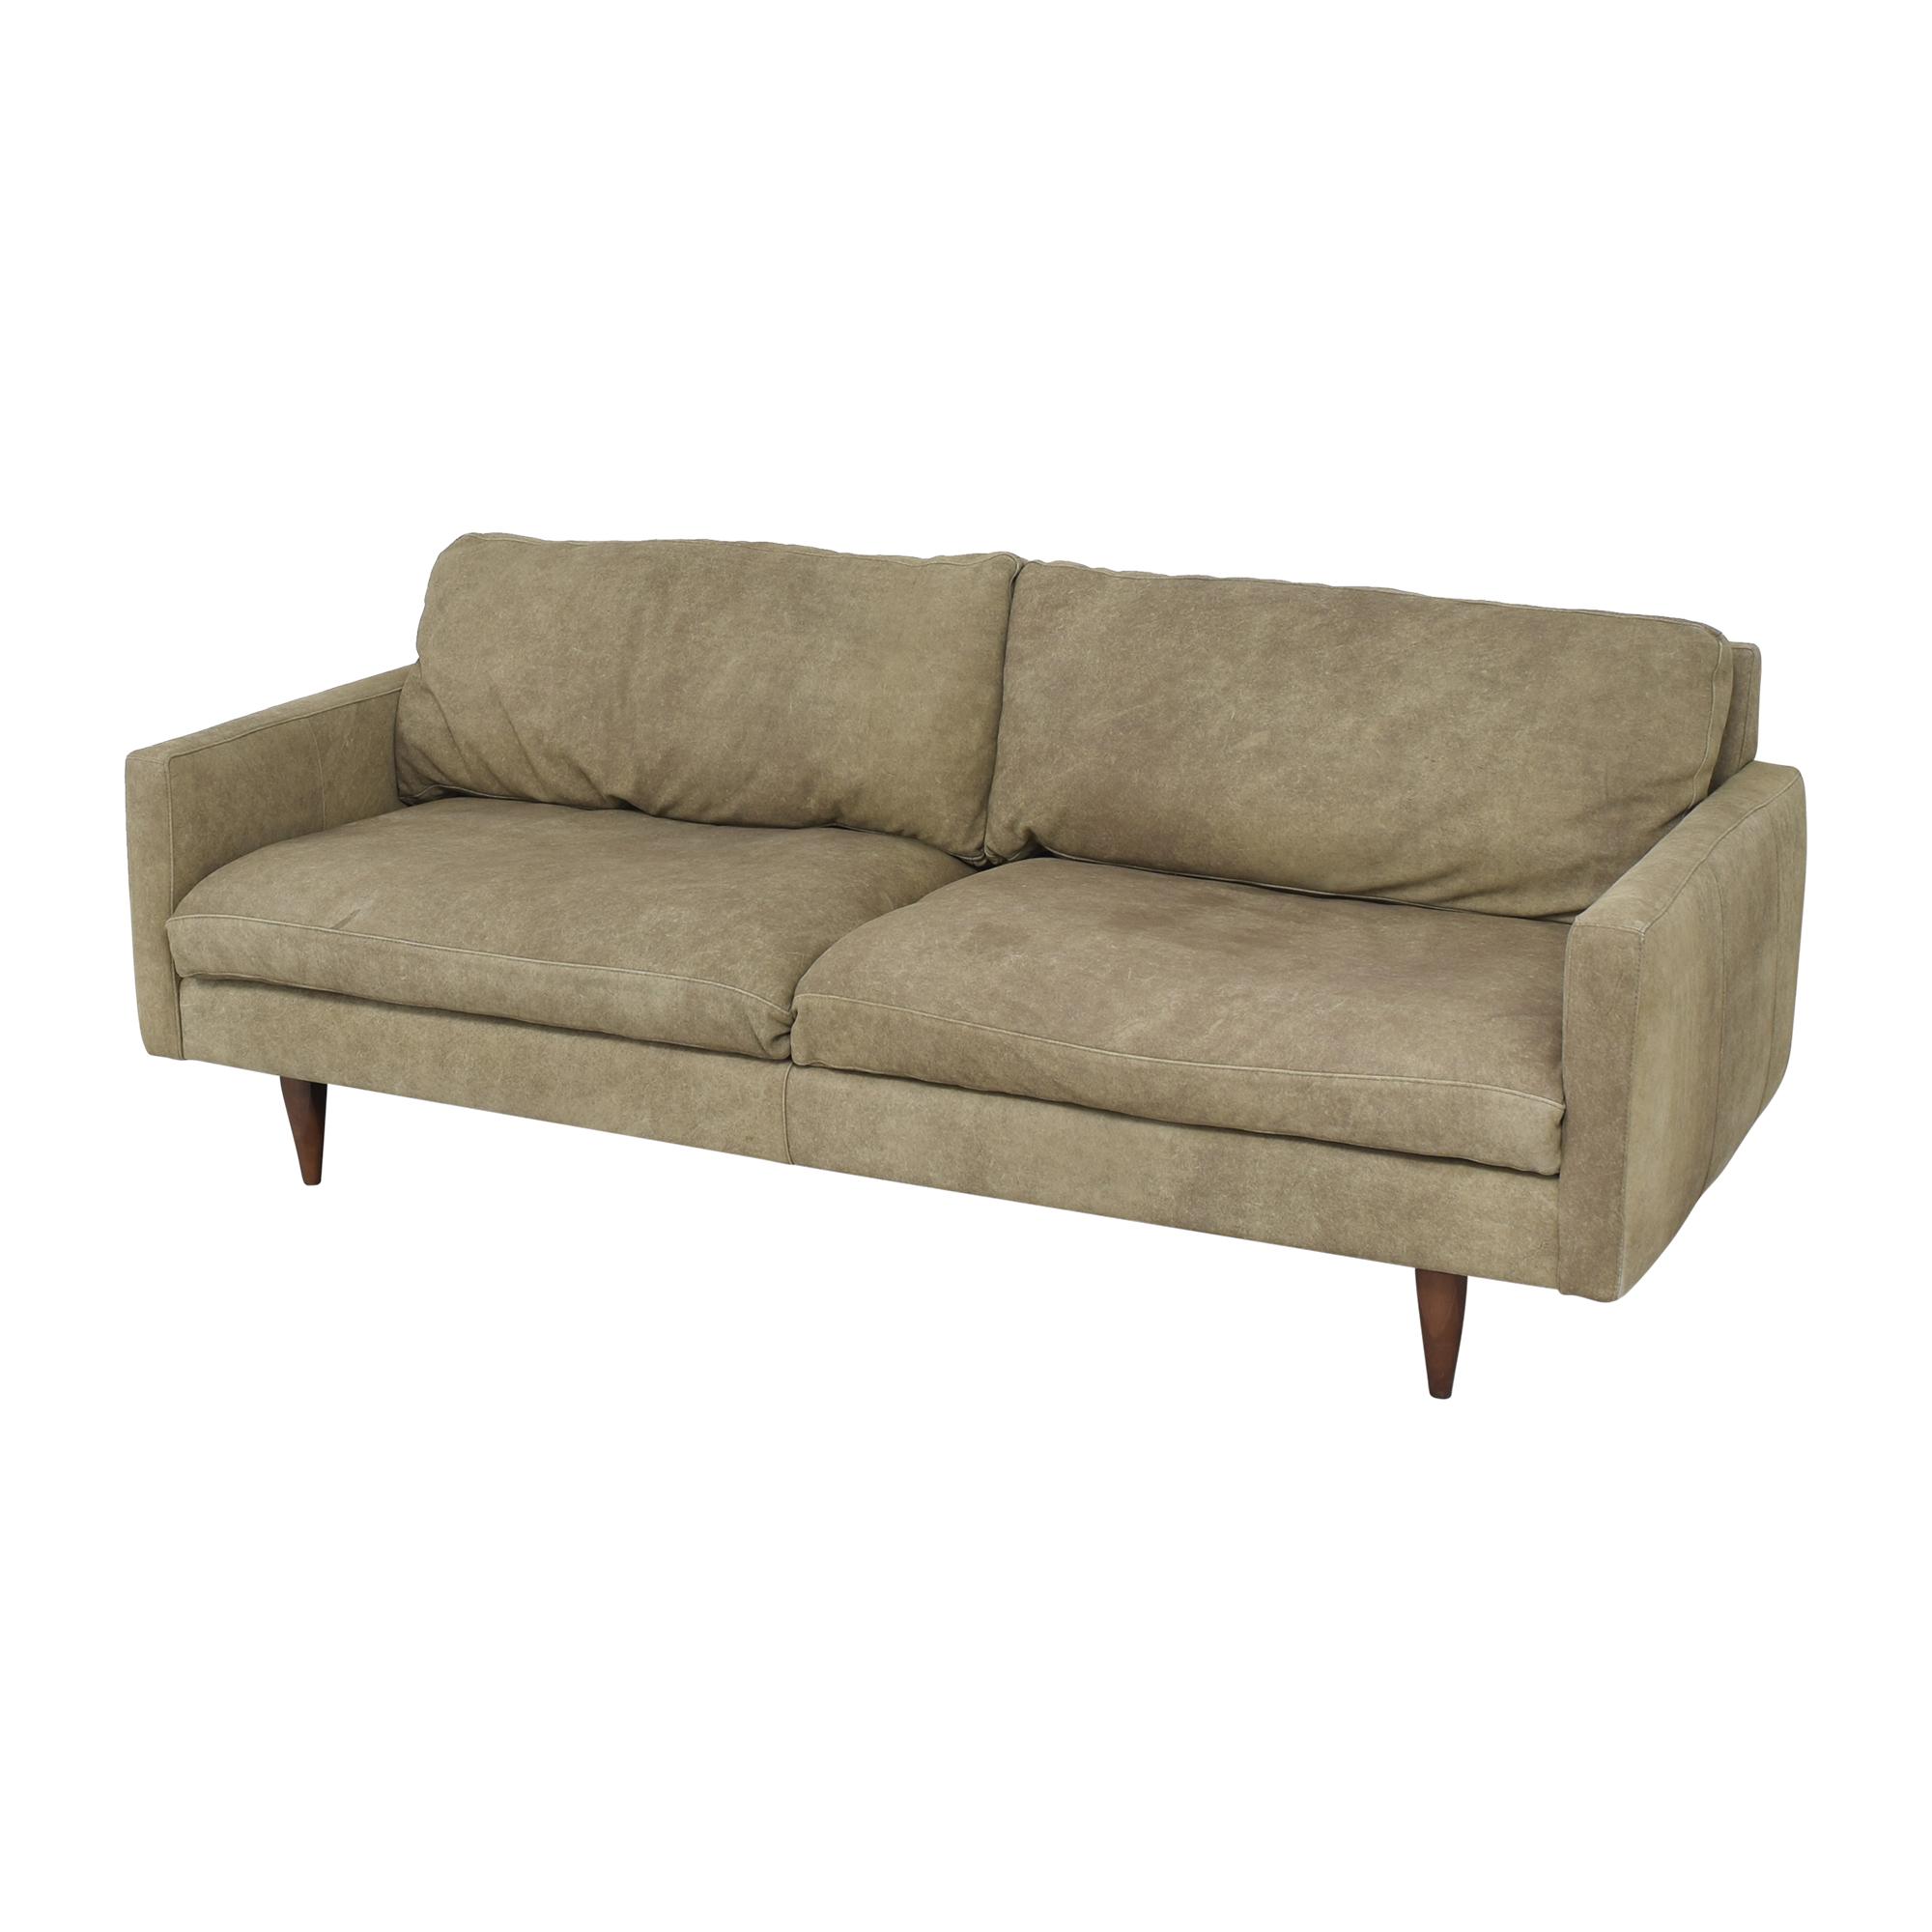 Room & Board Room & Board Jasper Two Cushion Sofa Classic Sofas